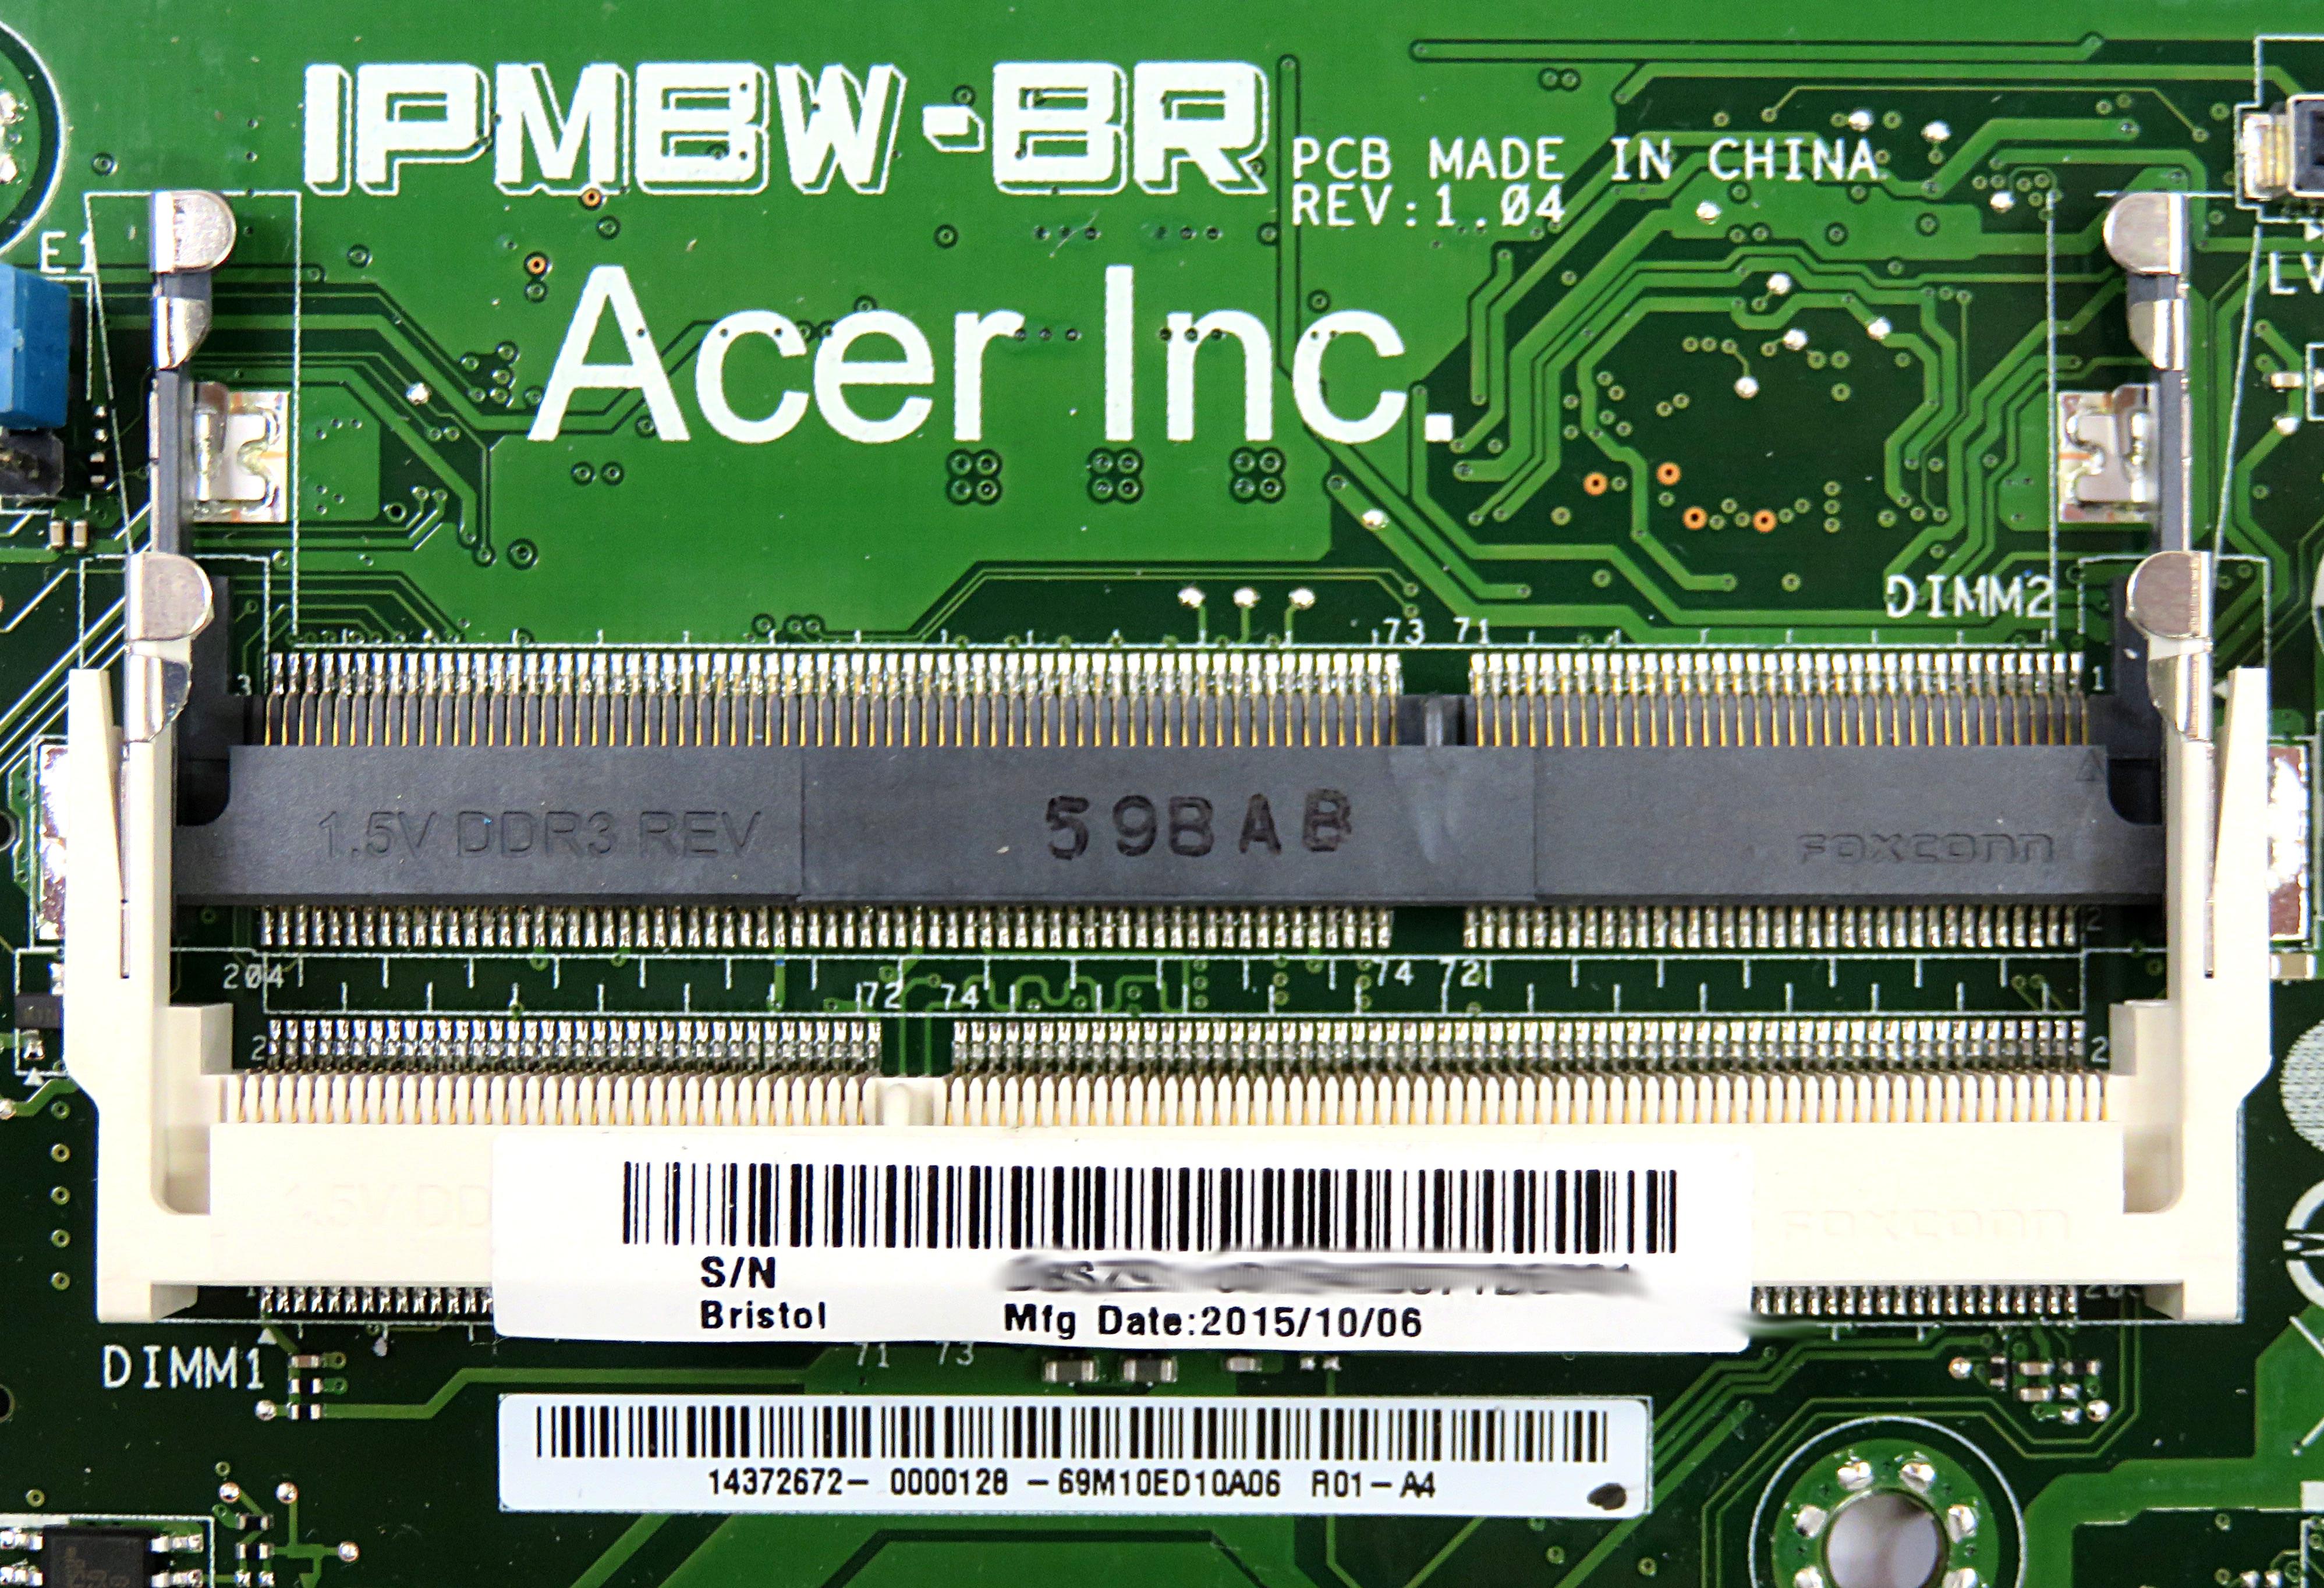 ACER IPMBW-BR WINDOWS 7 X64 TREIBER